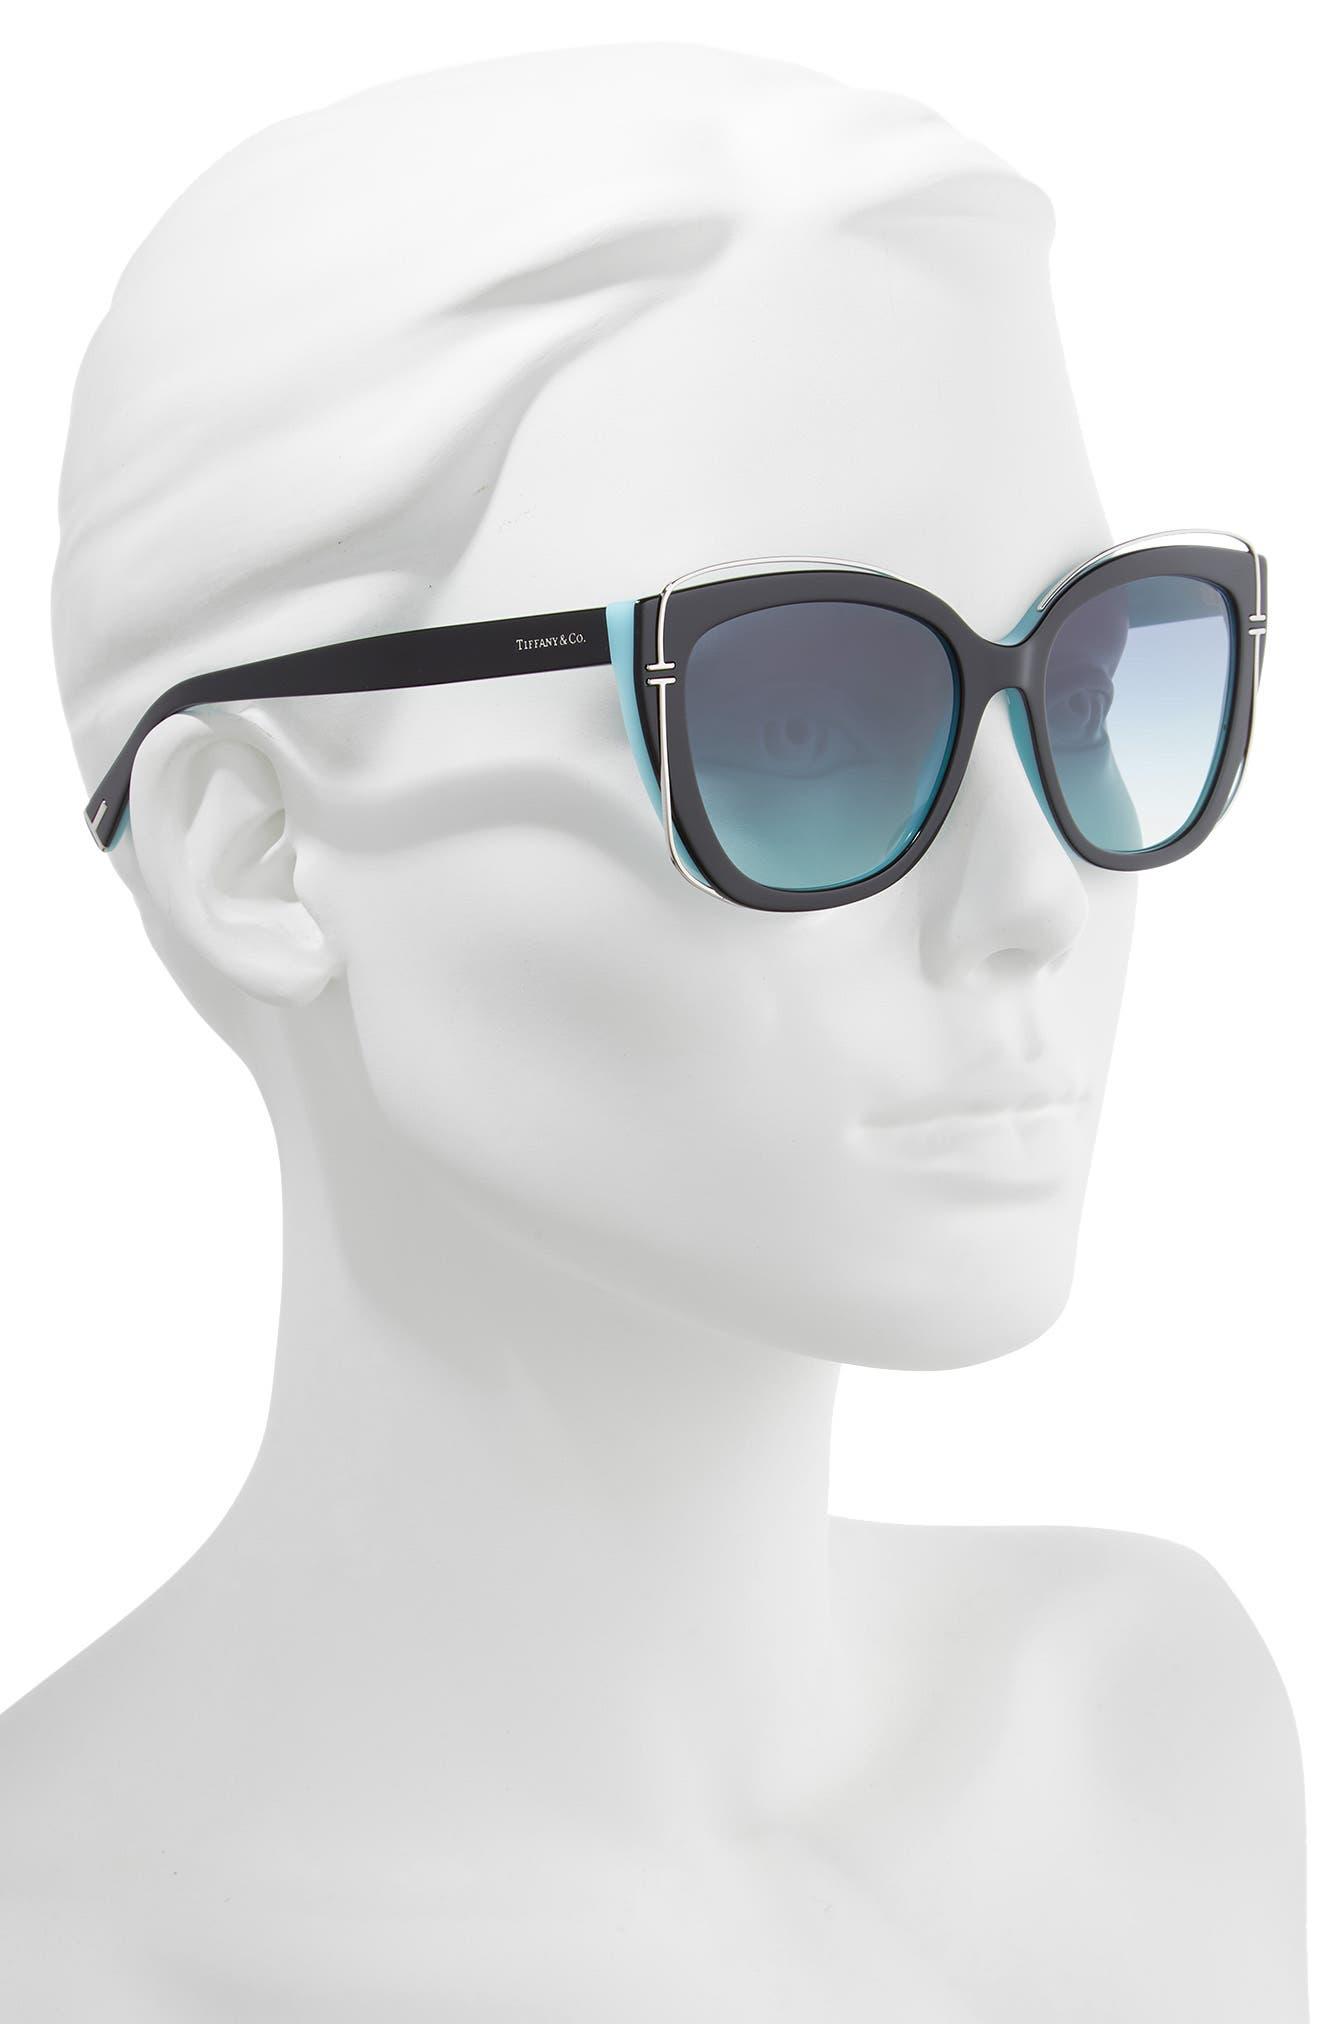 54mm Gradient Cat Eye Sunglasses,                             Alternate thumbnail 2, color,                             BLACK/ BLUE GRADIENT